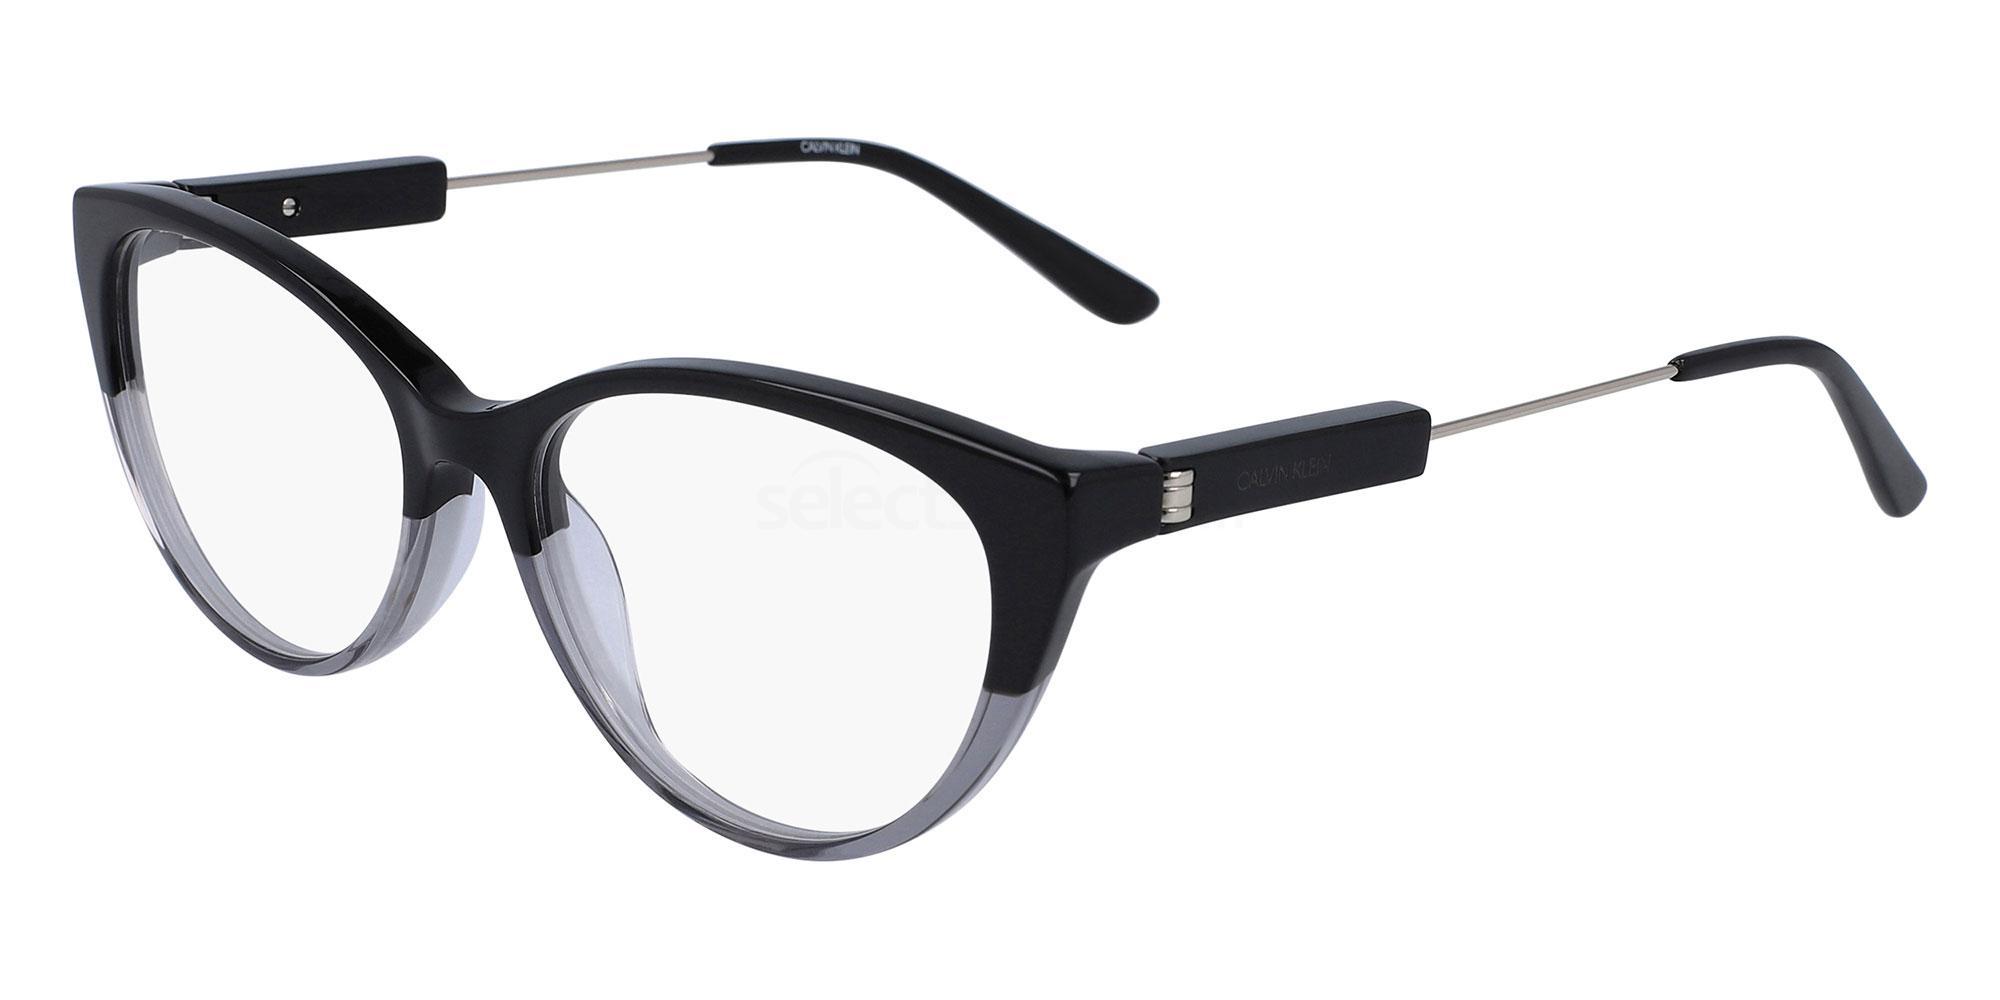 074 CK19706 Glasses, Calvin Klein